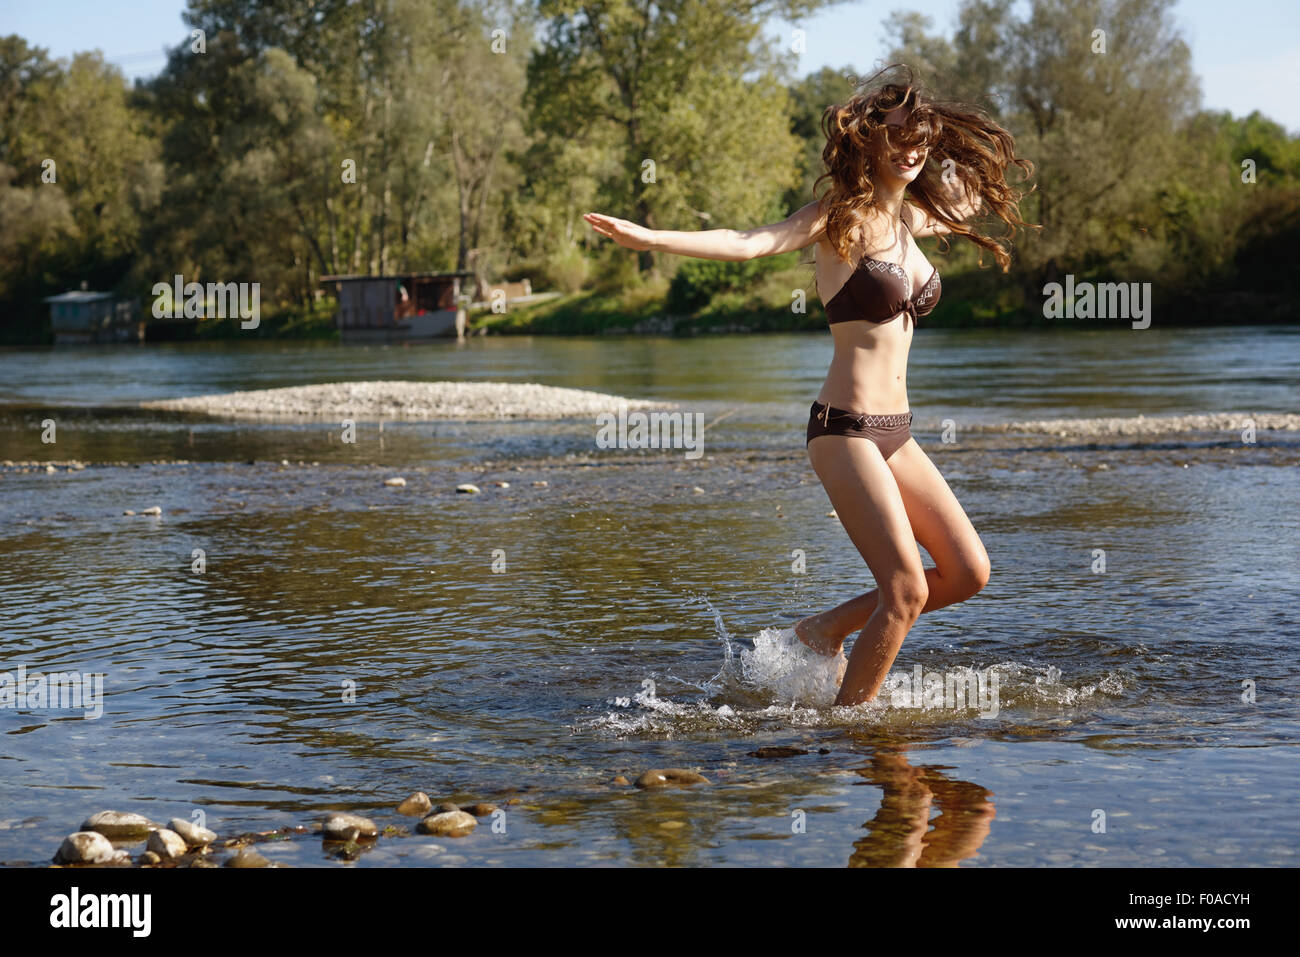 Young woman wearing a bikini splashing and playing in river - Stock Image